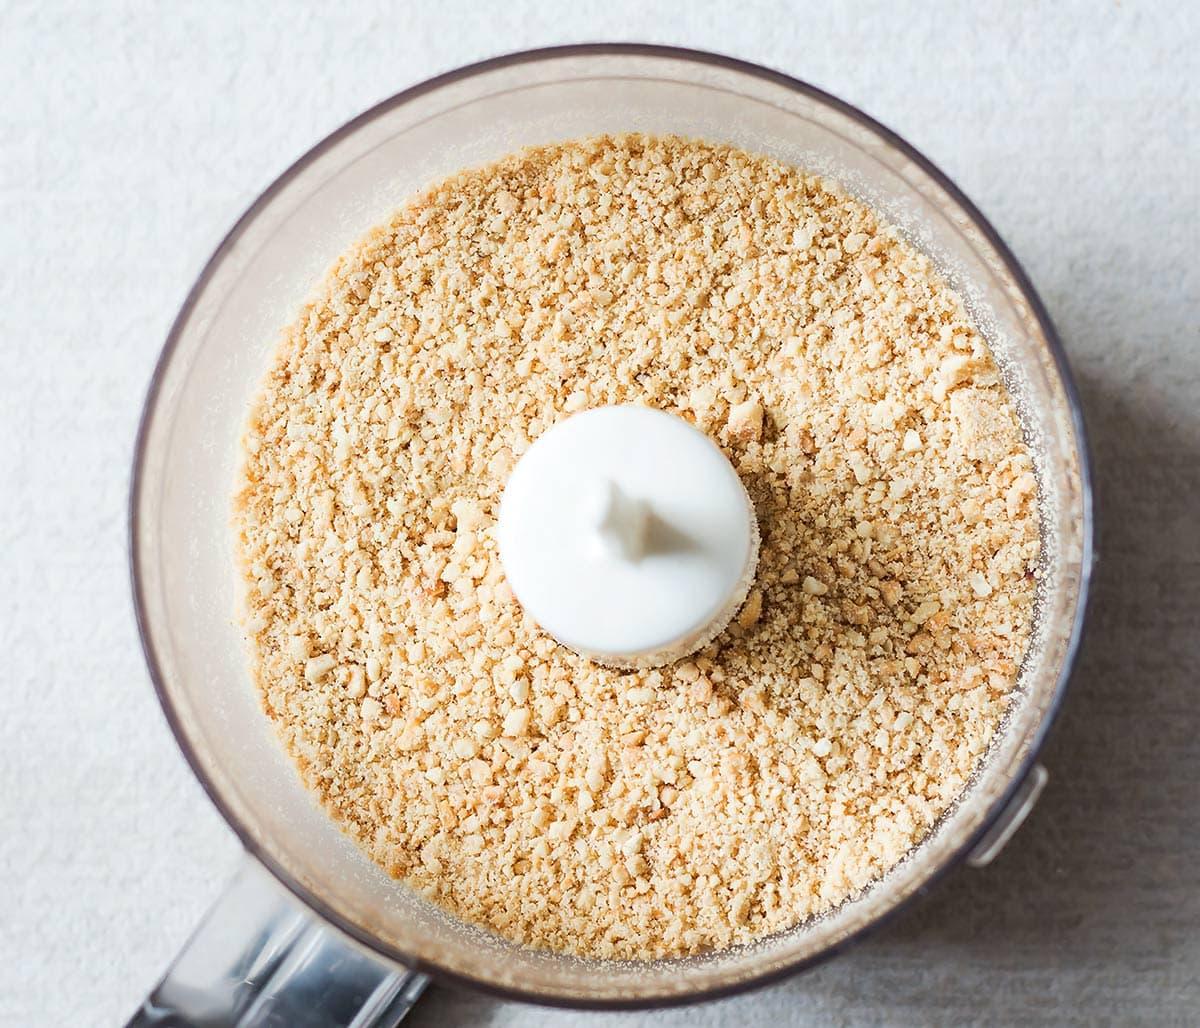 Ground cashews in food processor